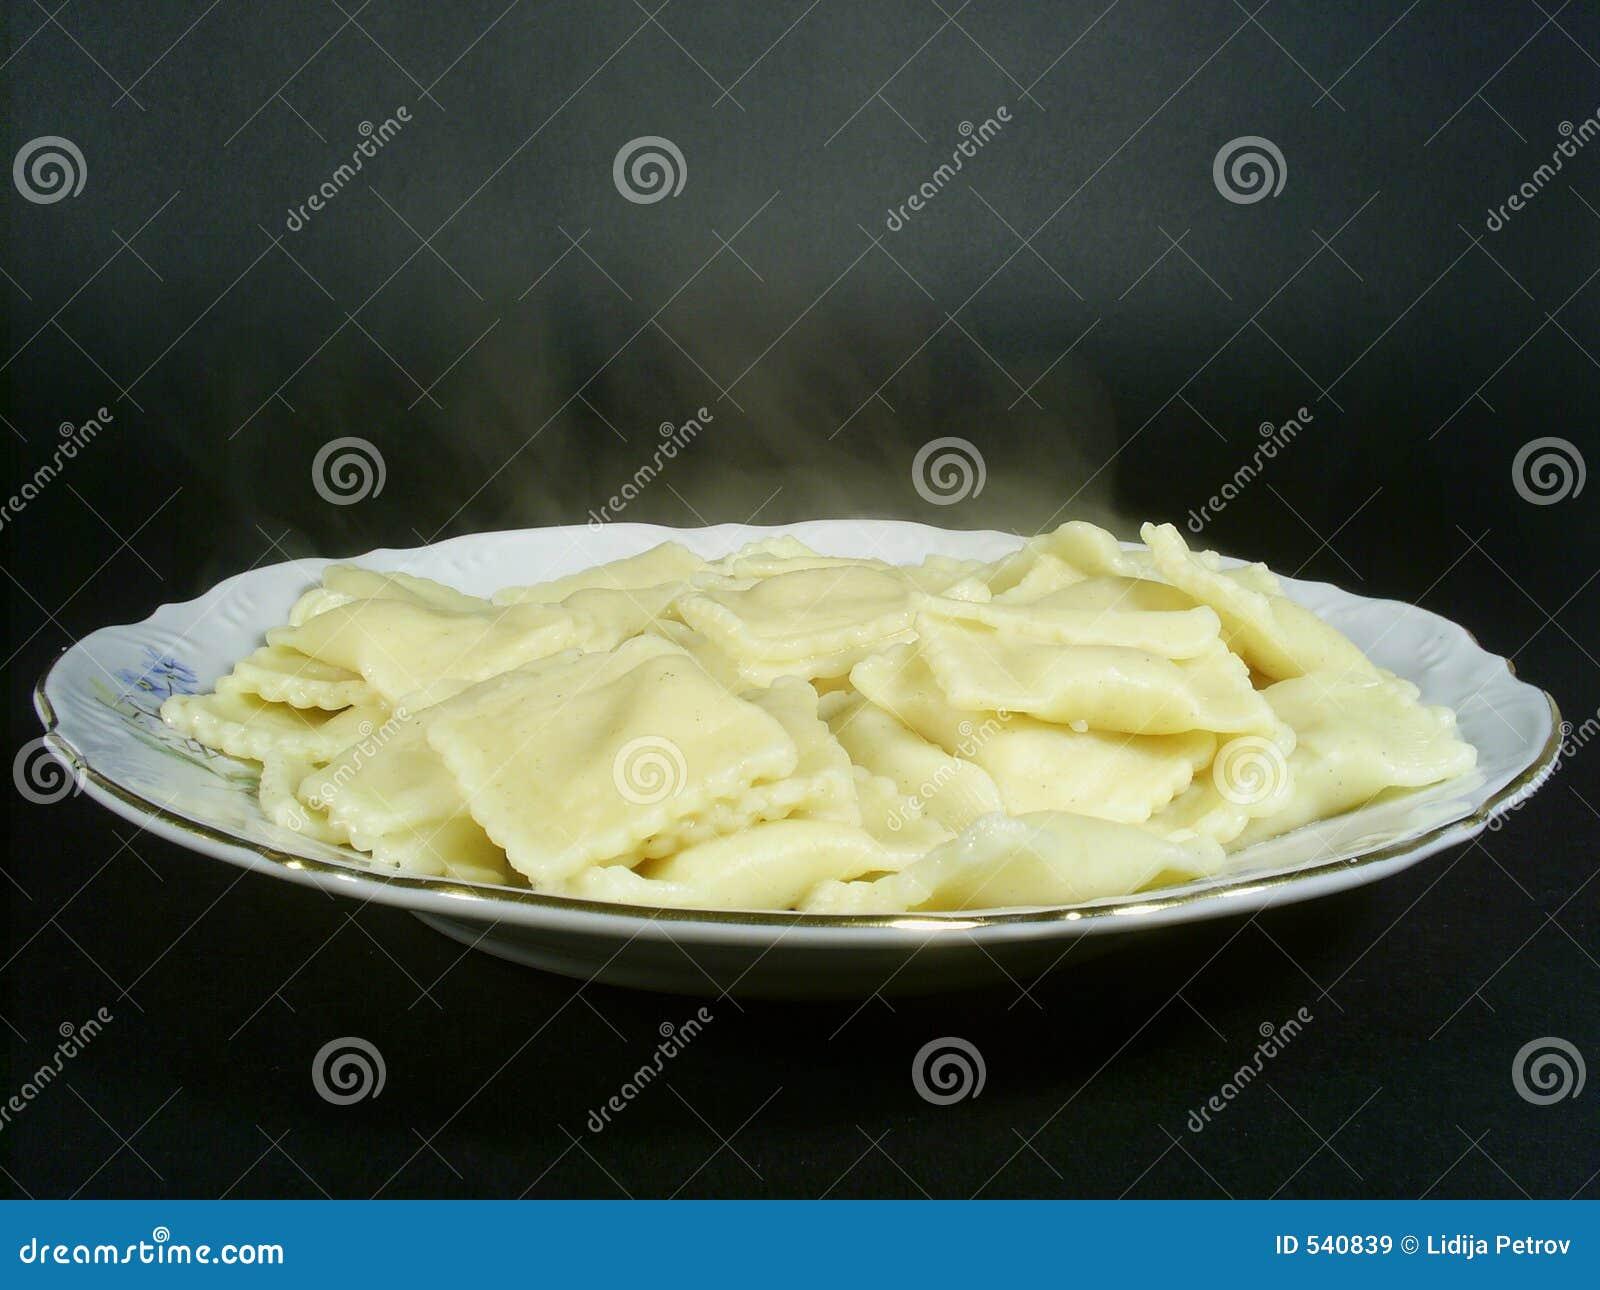 Download 粘贴 库存图片. 图片 包括有 意大利面食, 黄色, 食物, 准备, 通心面, 正餐, 粘贴, 晚饭, 面条 - 540839